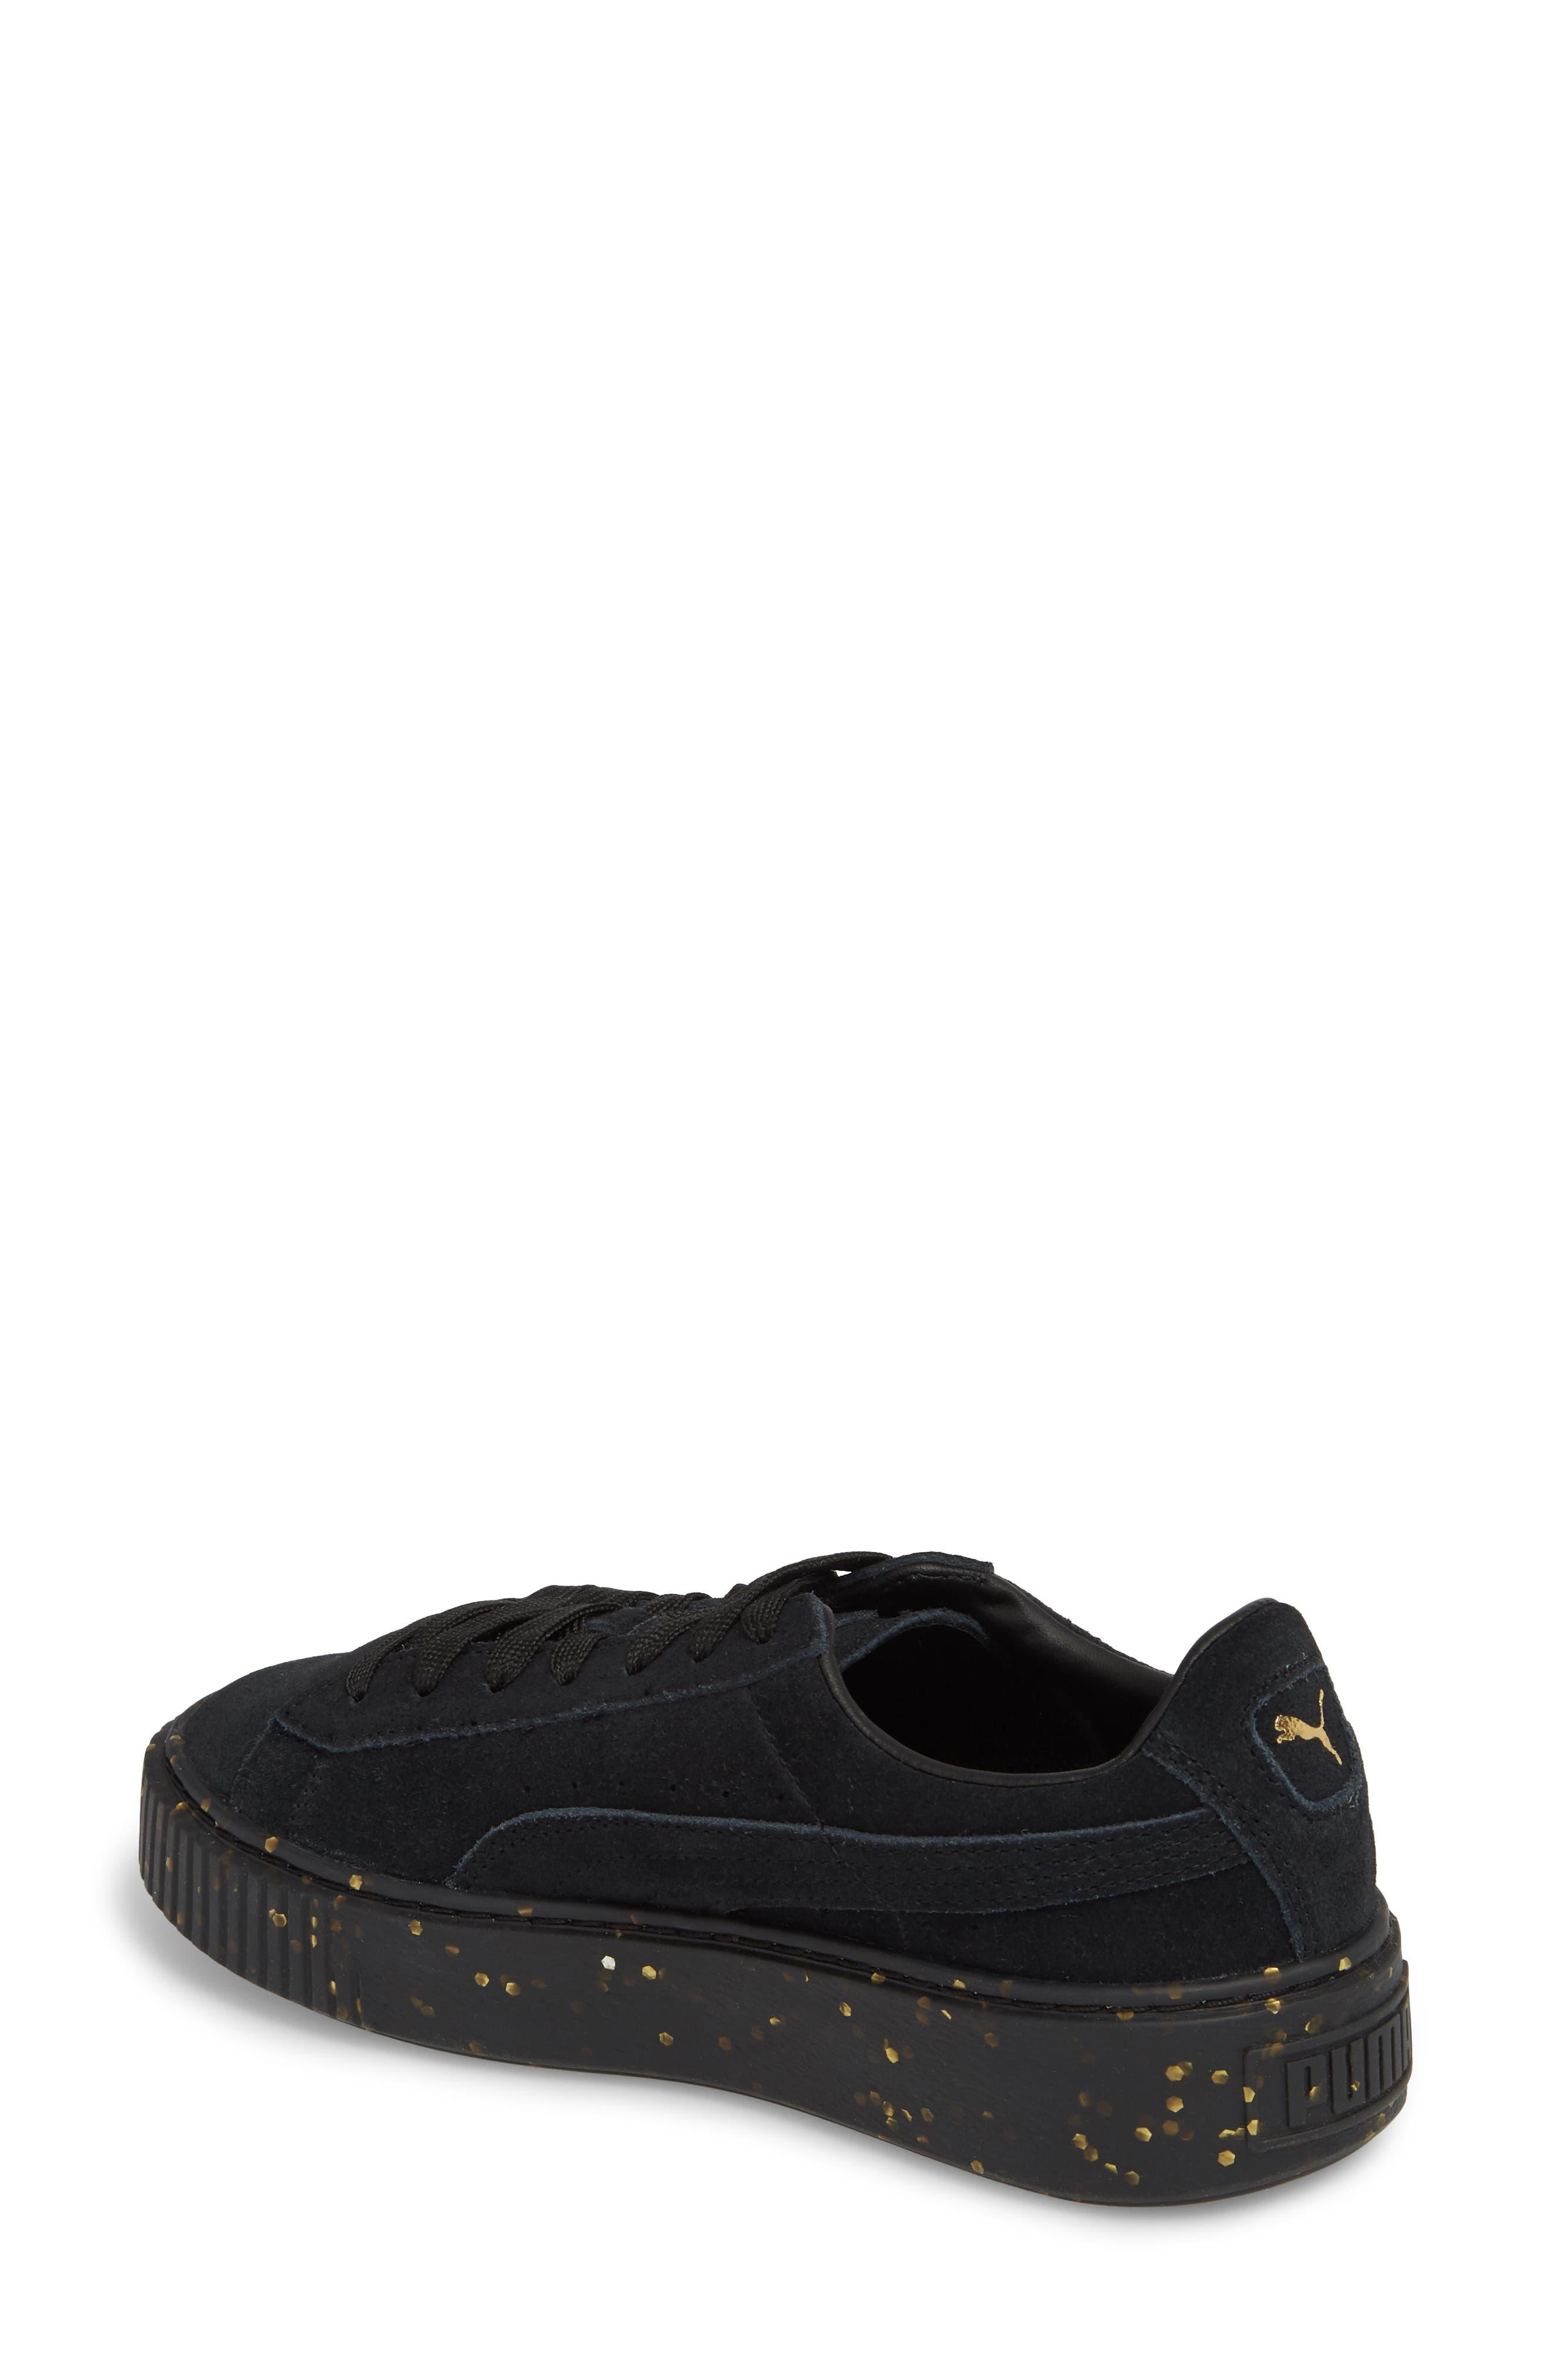 Suede Platform Sneaker,                             Alternate thumbnail 2, color,                             001